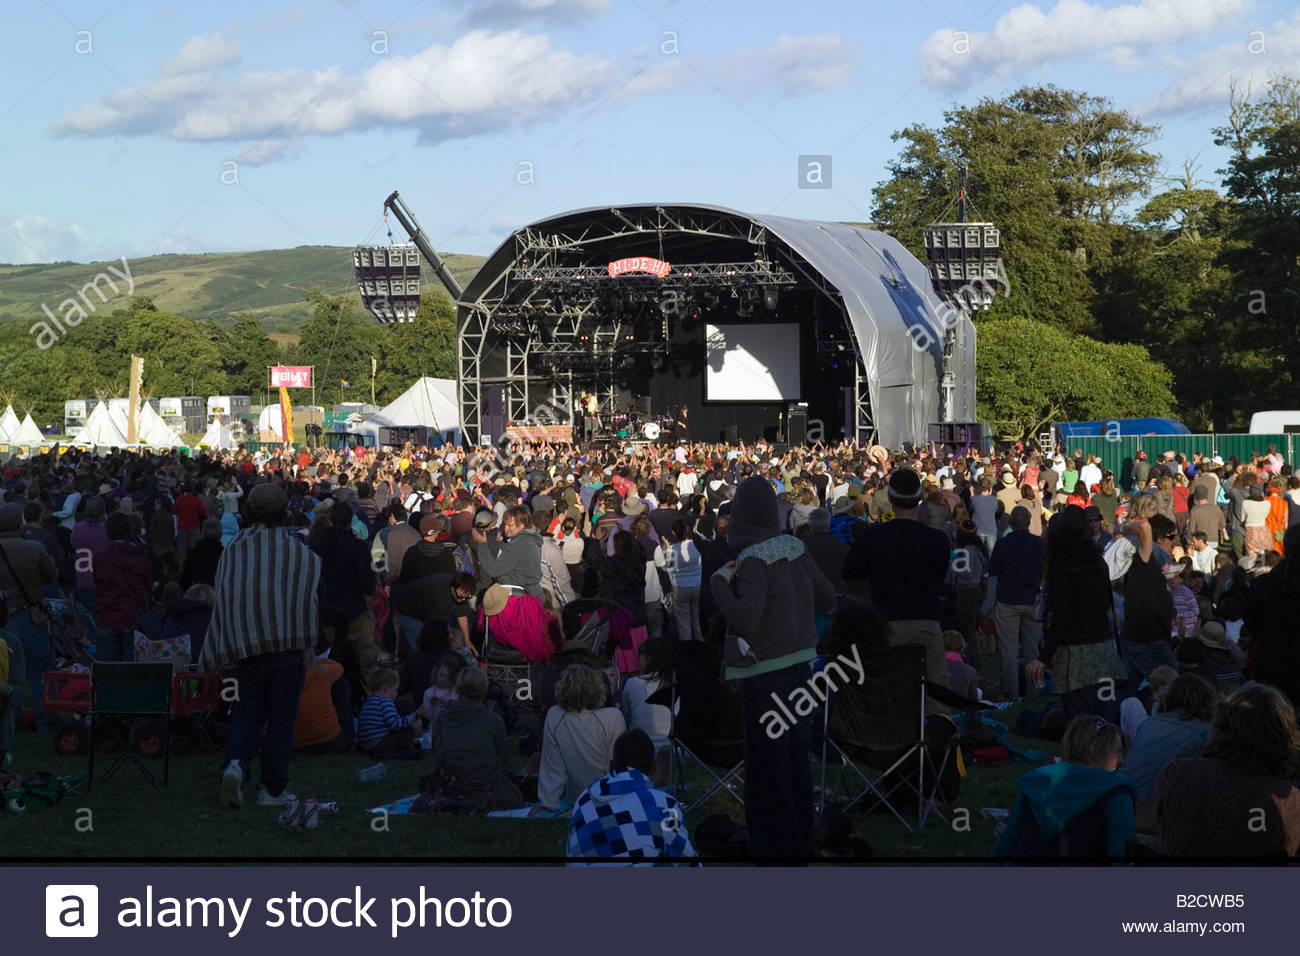 Camp Bestival Music Festival July 2008 Lulworth Estate Dorset England - Stock Image